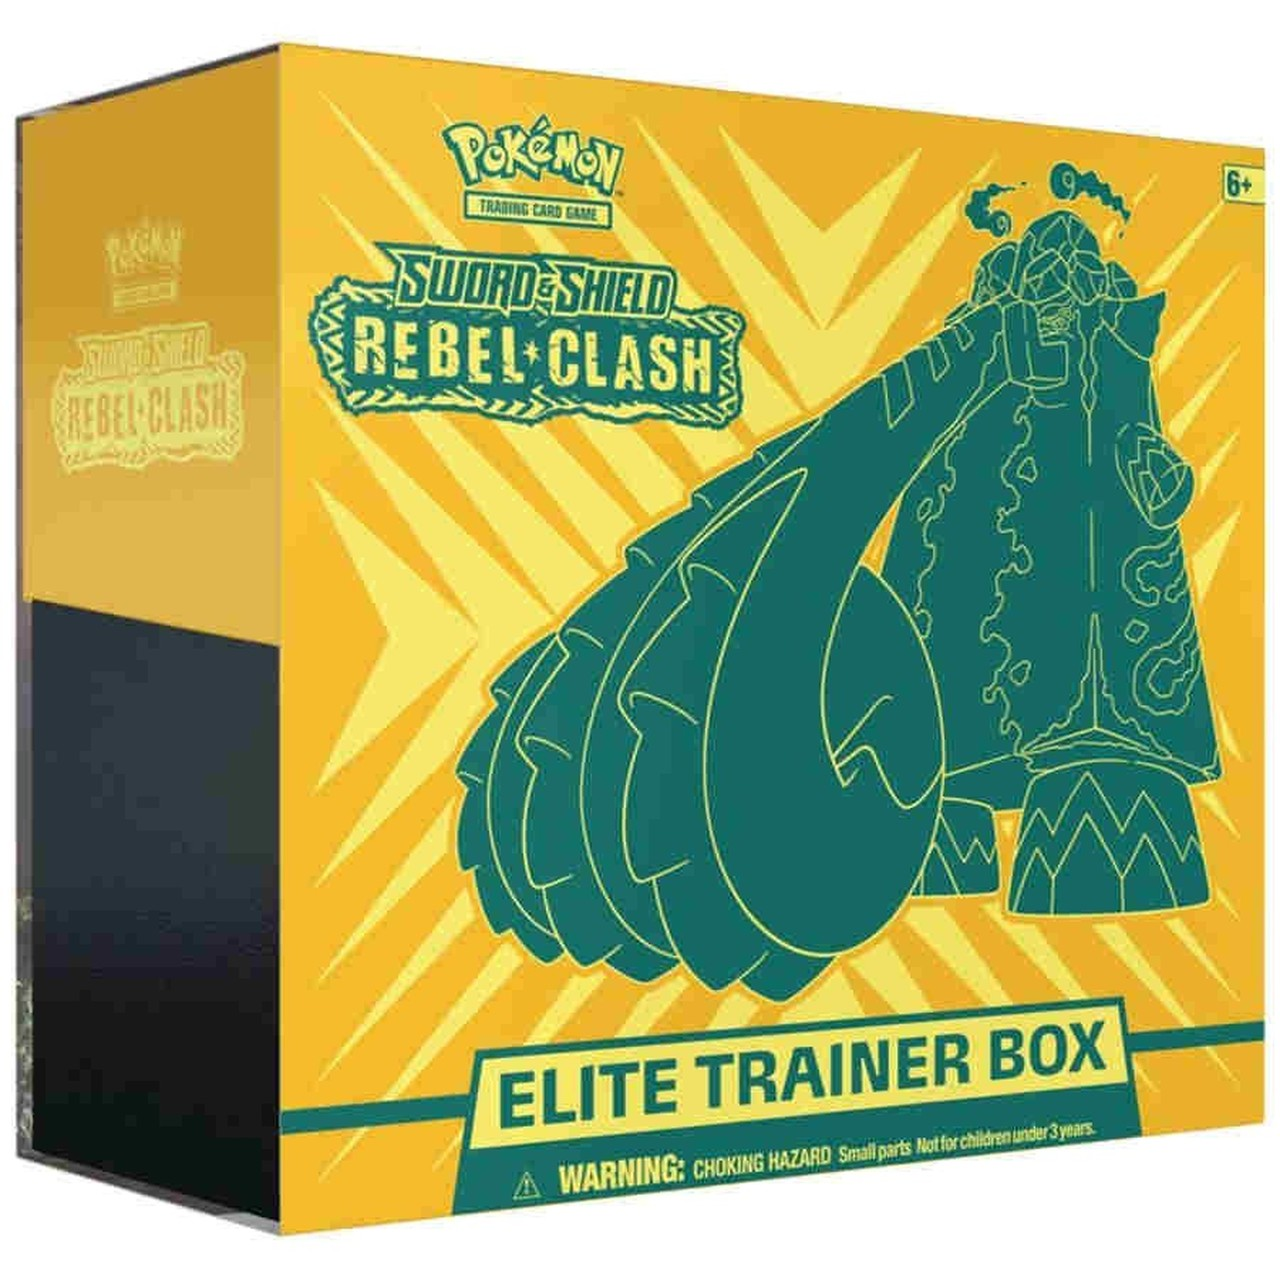 Pokemon Tcg: Sword & Shield - Rebel Clash Elite Trainer Box